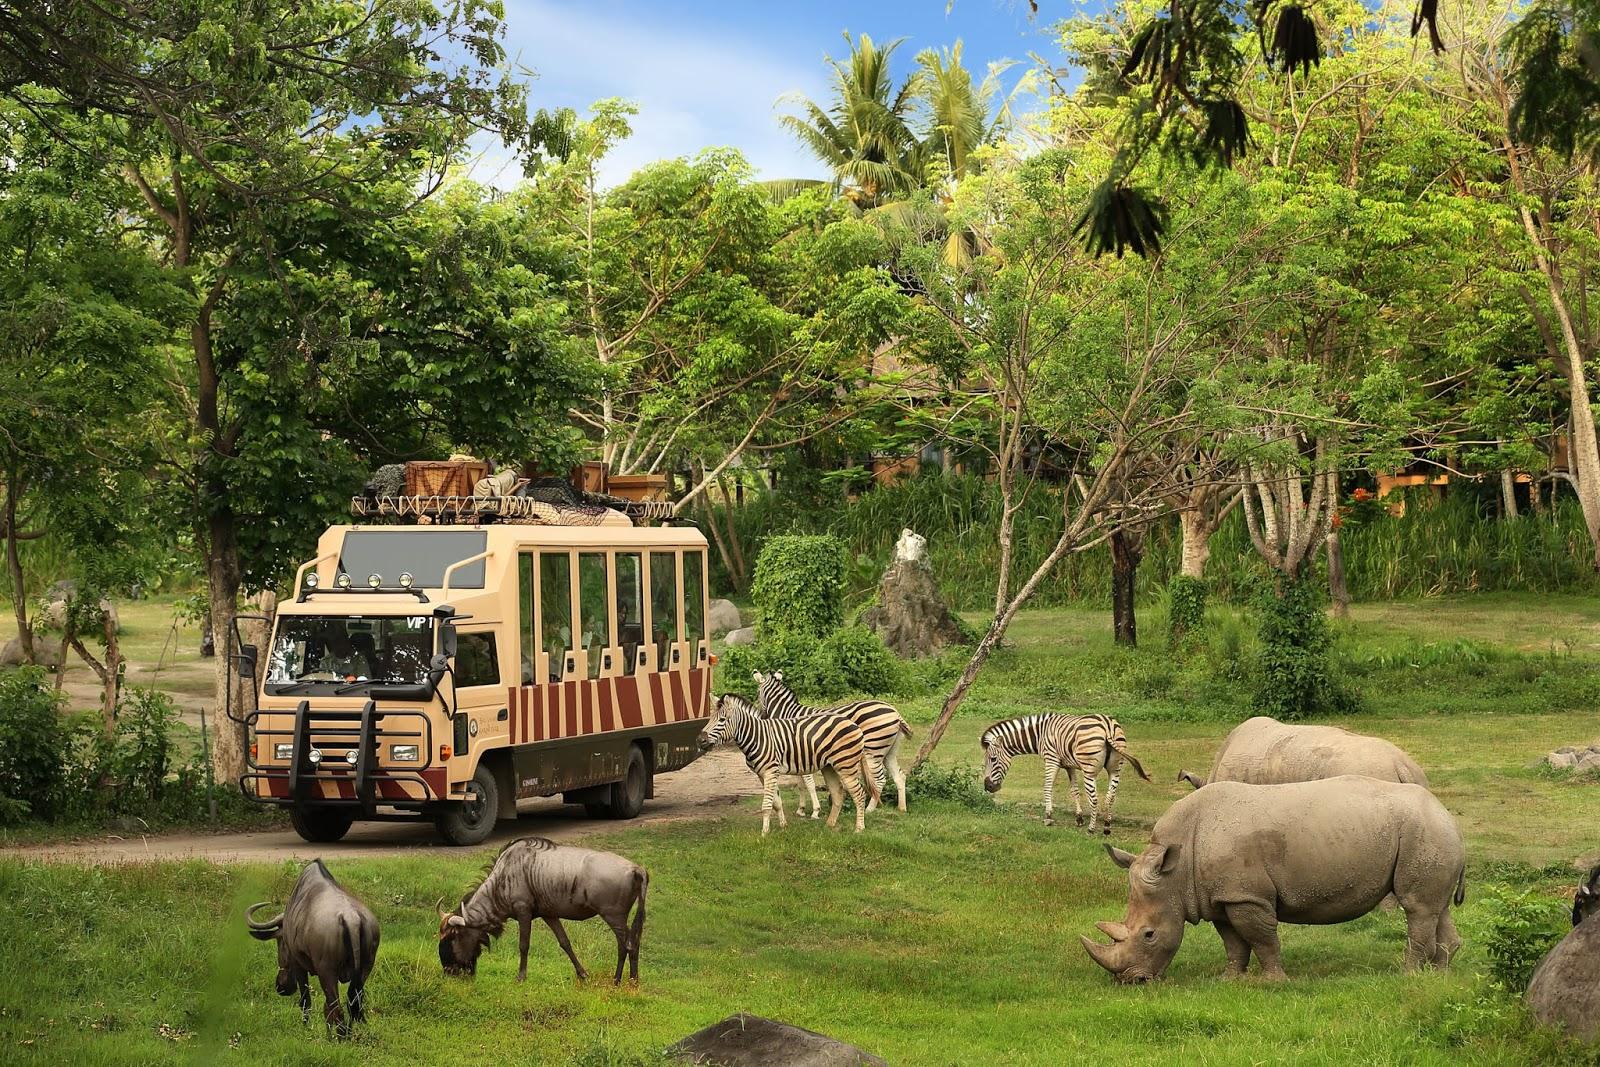 vinpearl safari-du lich tet 2020-elleman-0120